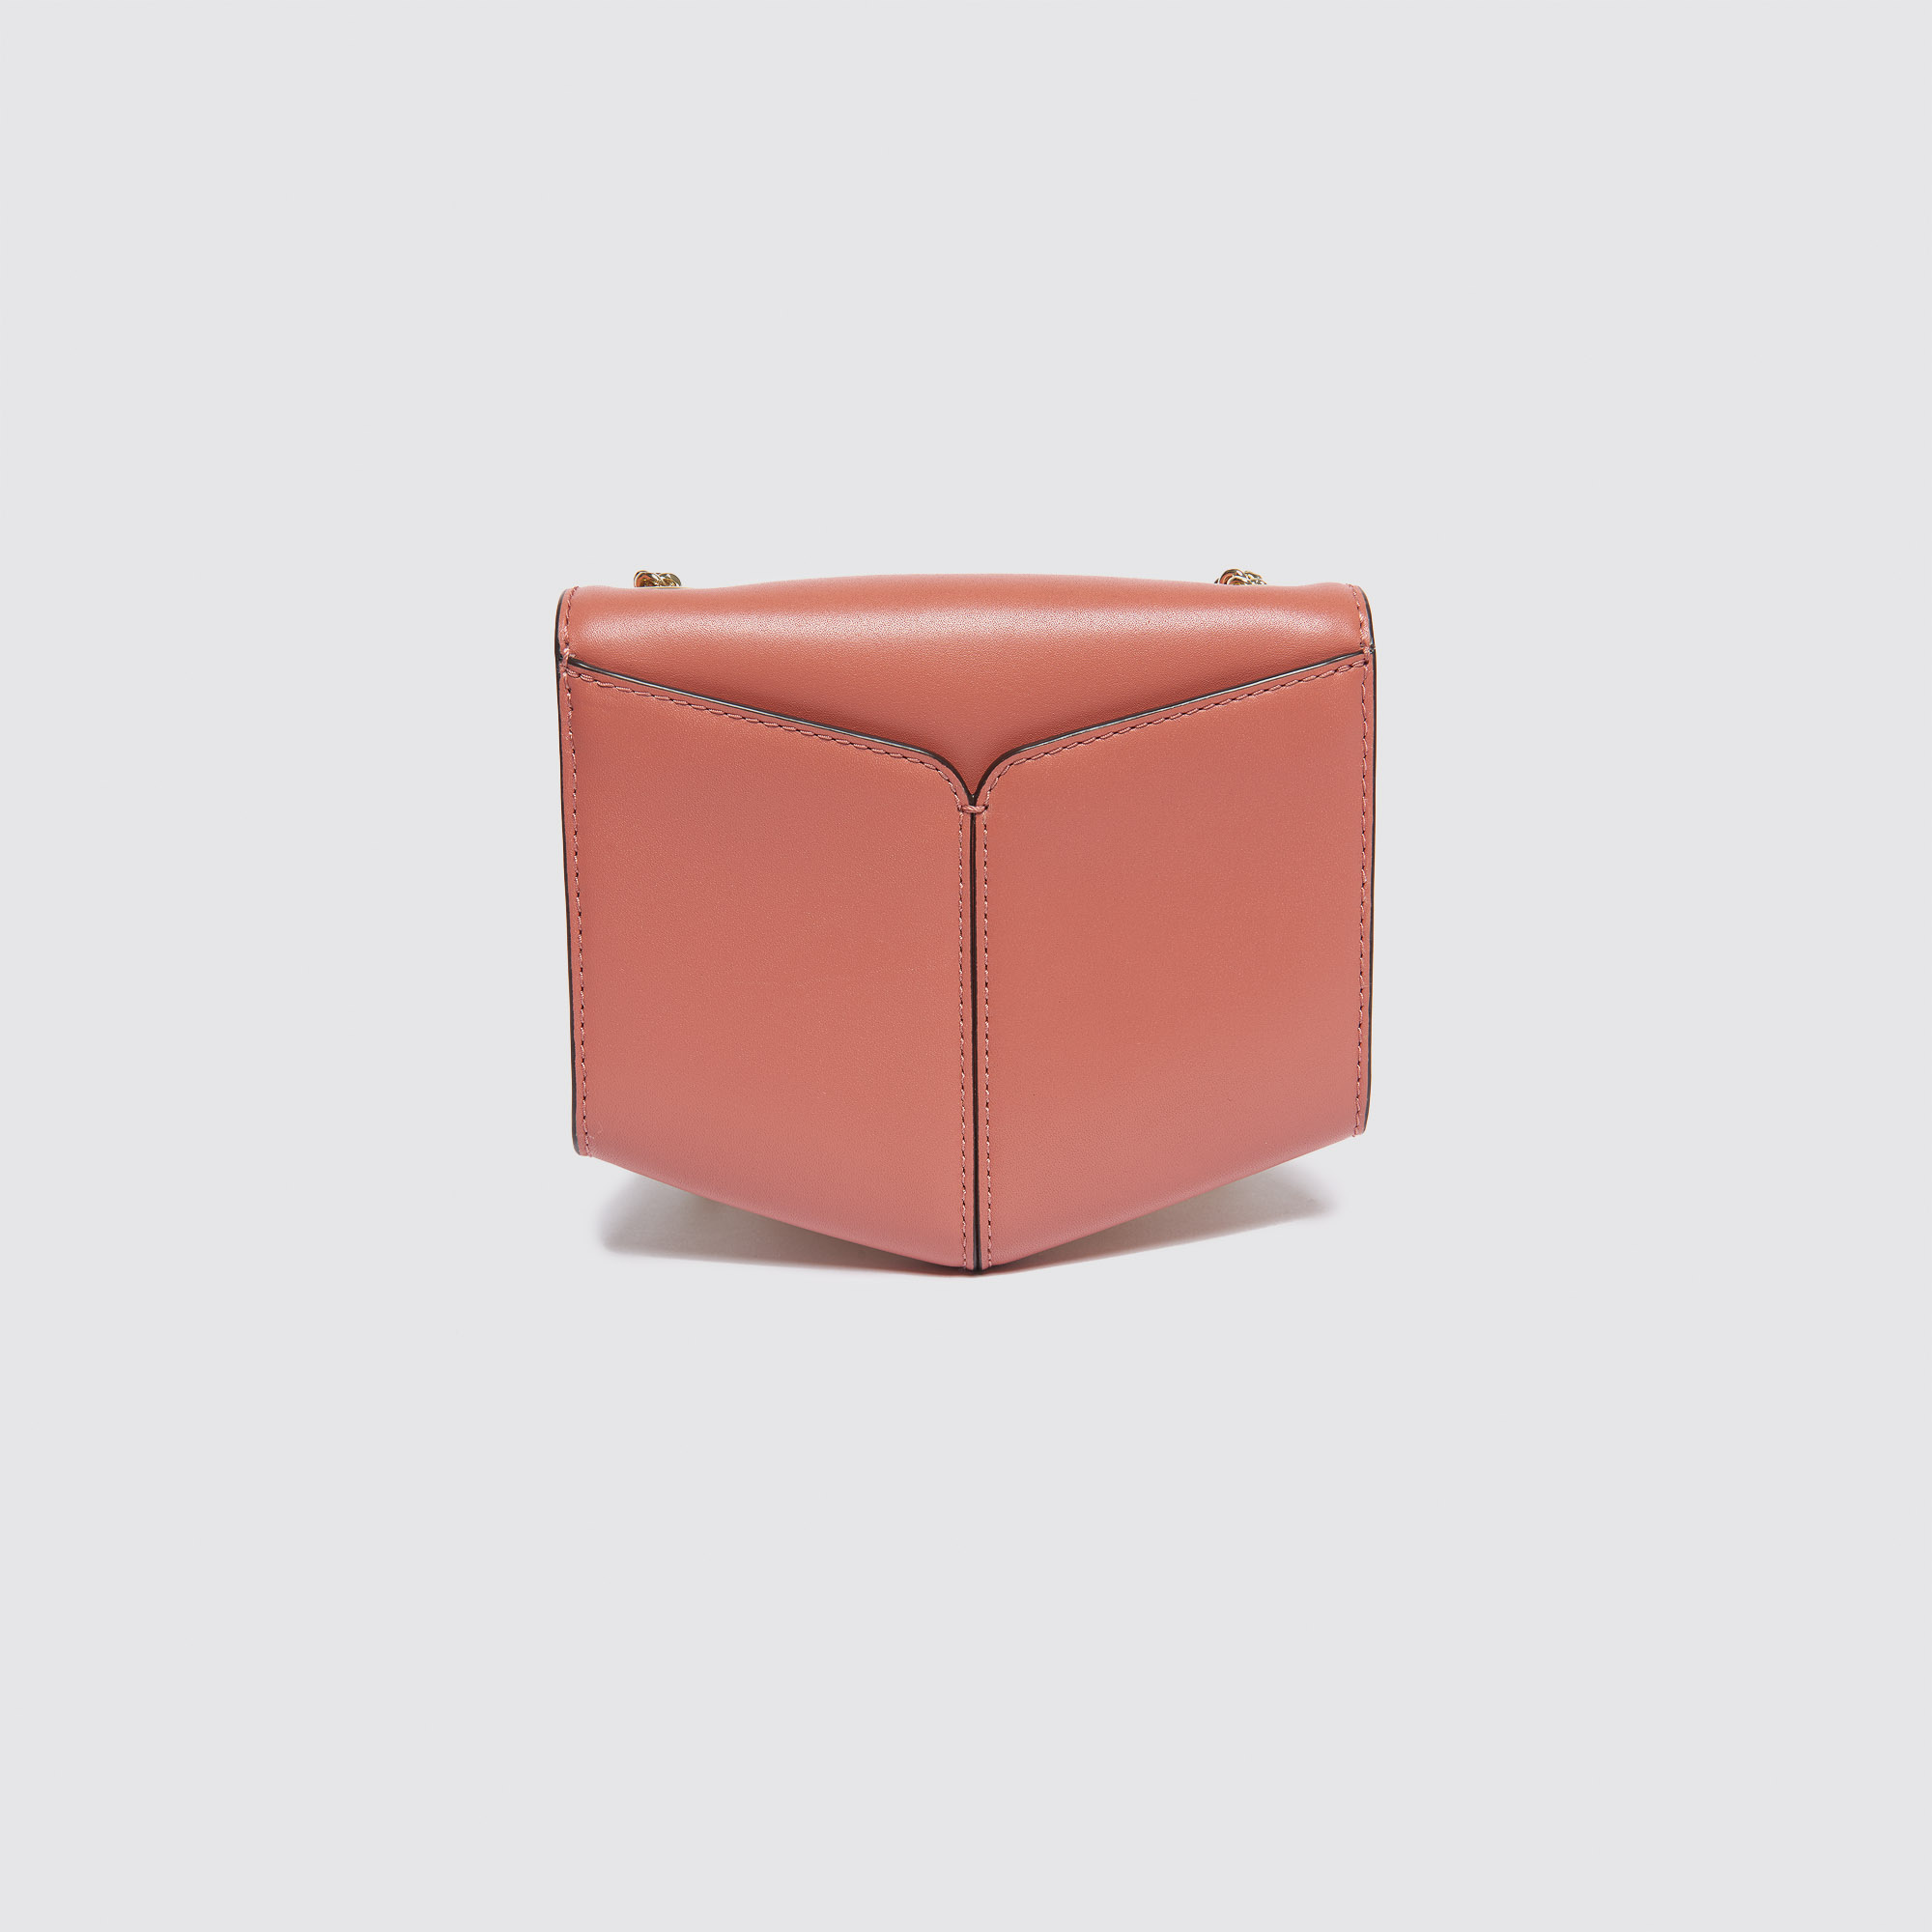 Borsa Lou piccola : Tutte le Borse colore Hâle